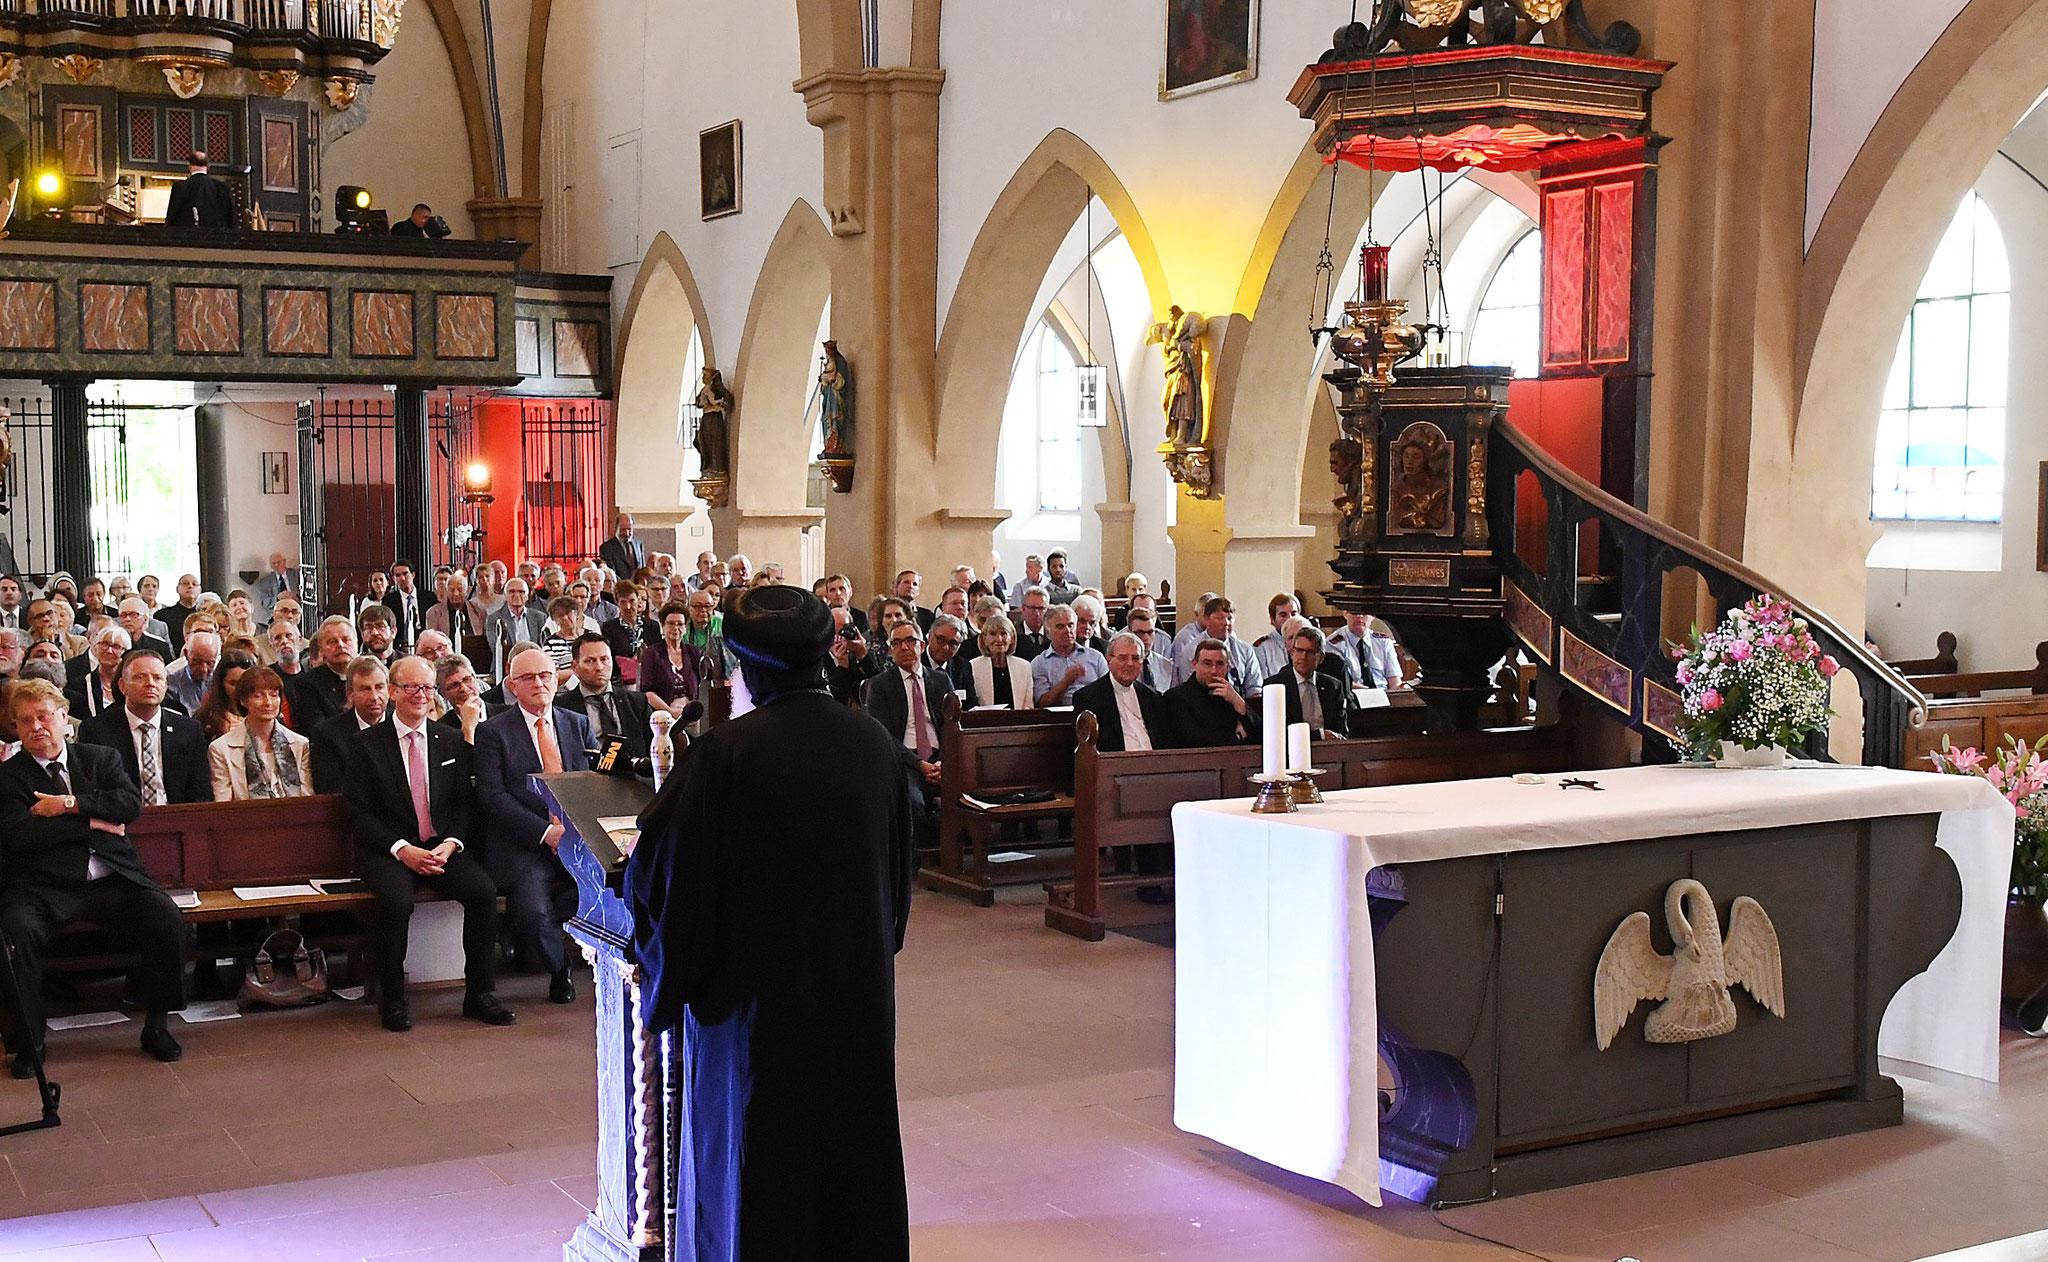 Festakt in der katholischen Pfarrkirche St. Johannes Baptist. Foto: Maria Hopp